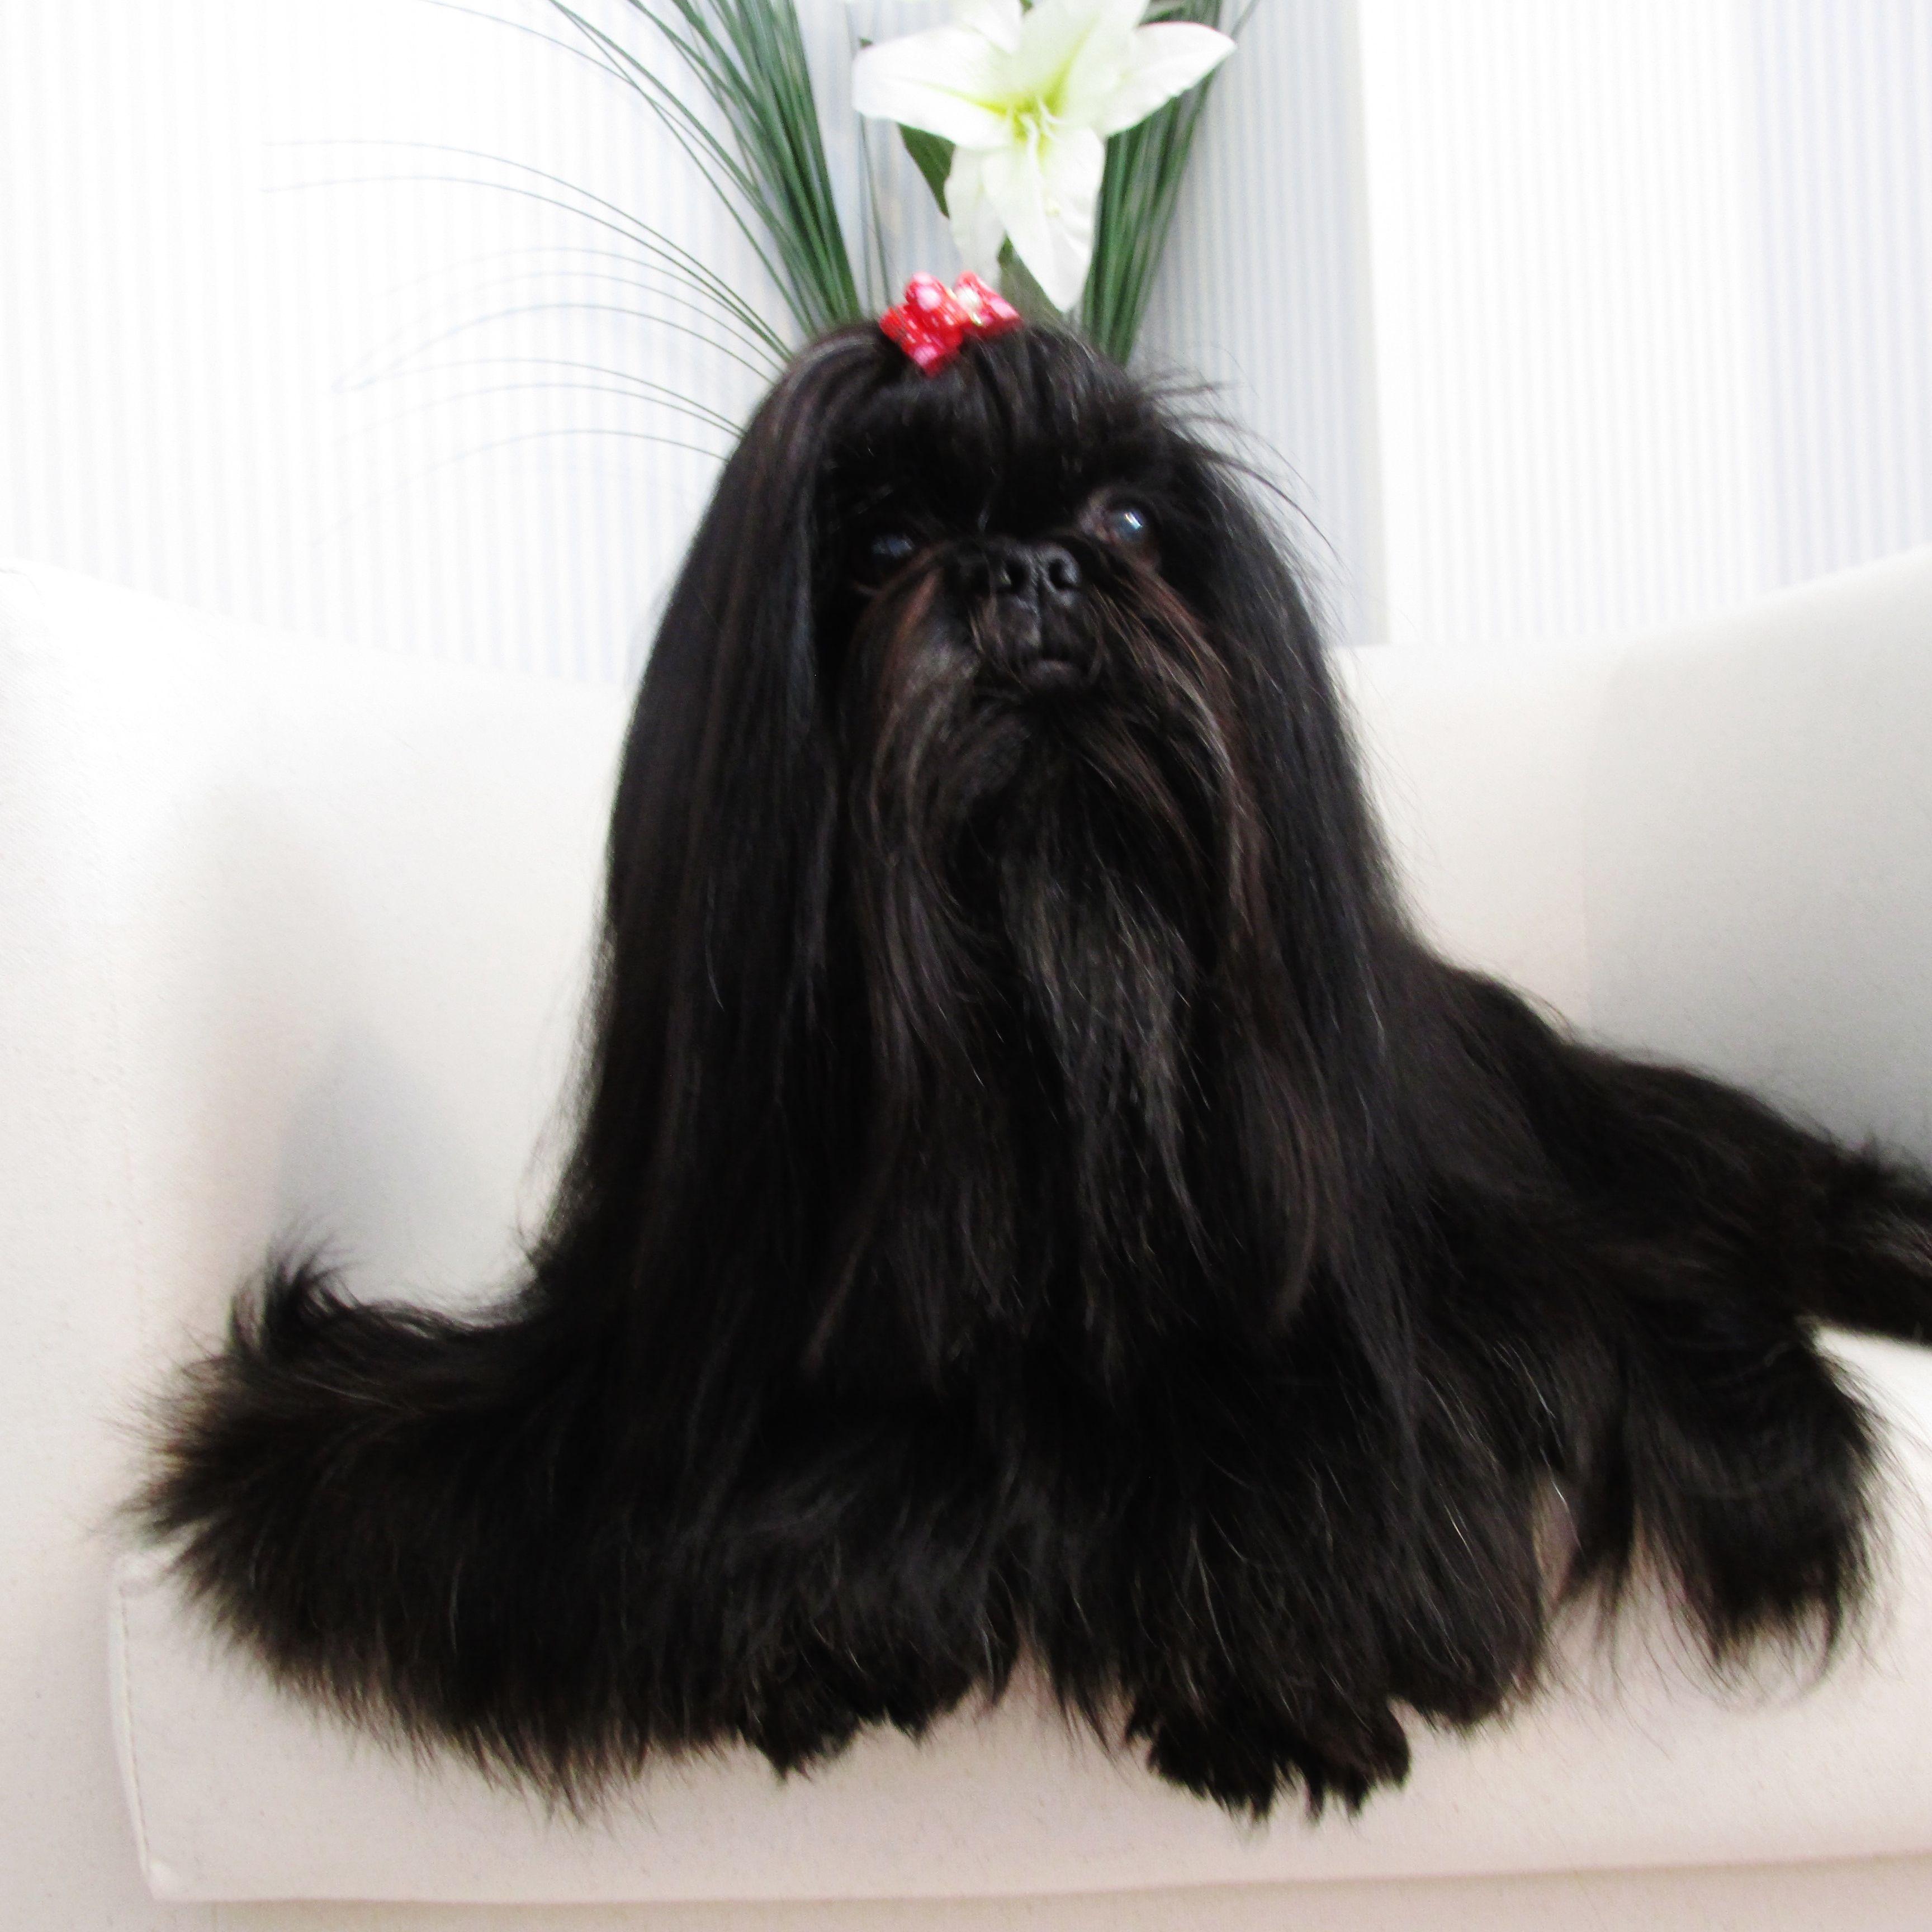 Shih Tzu Black Female Shih Tzu Shih Tzus Shih Tzu Dog